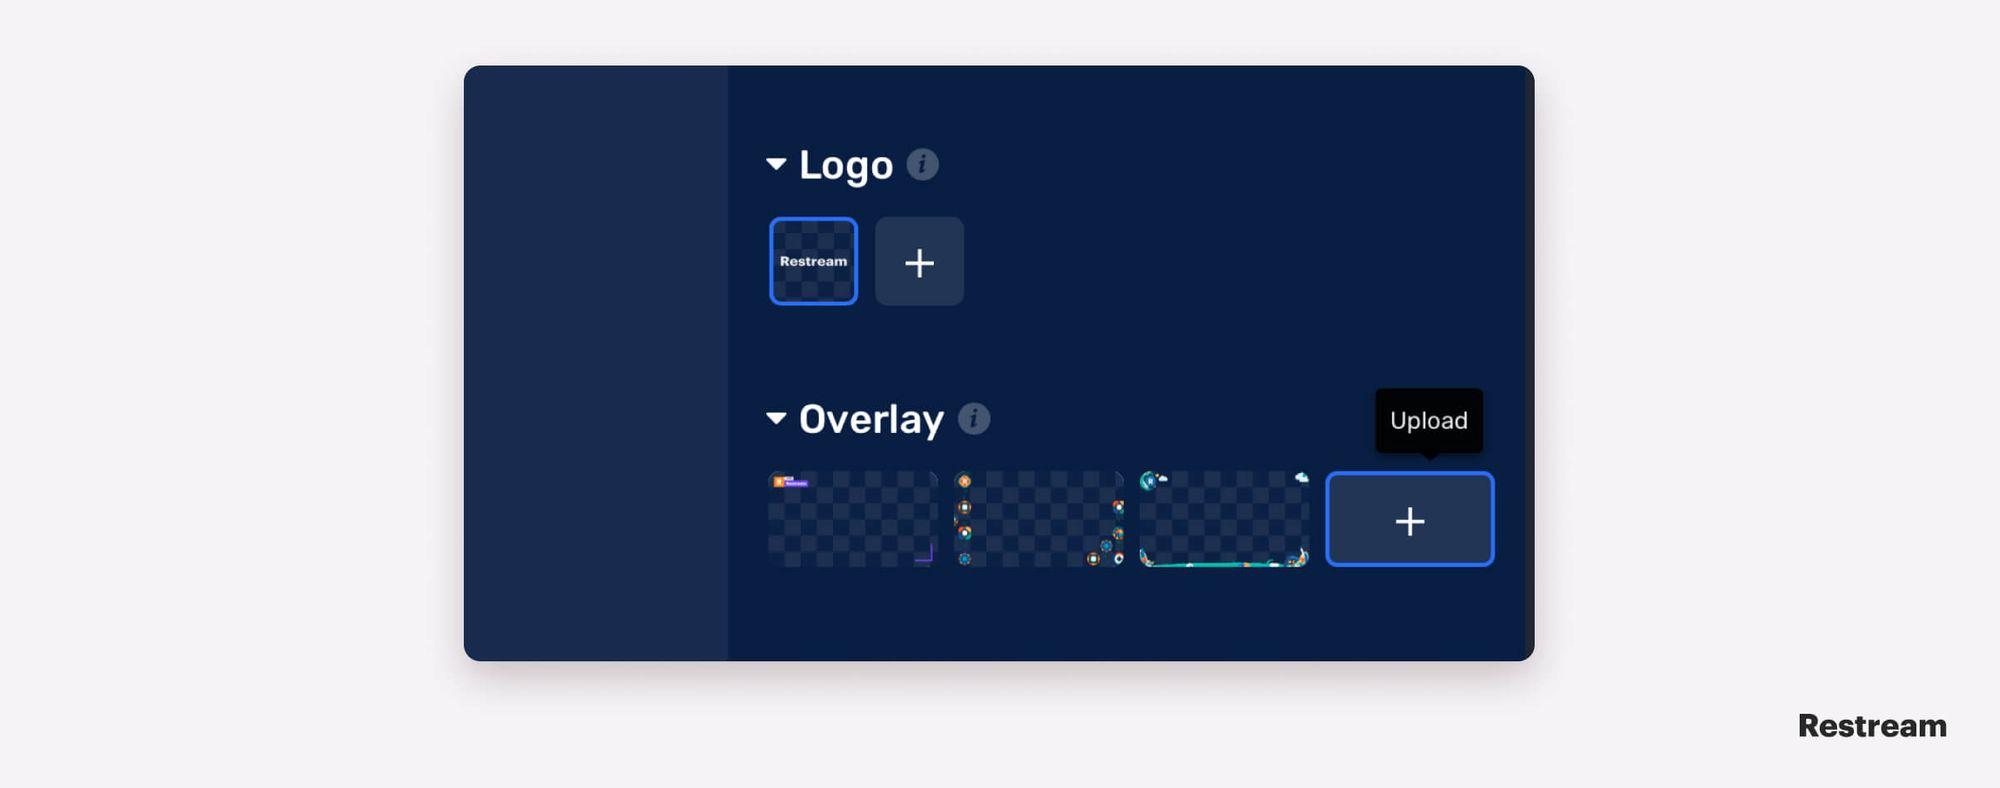 How to add graphics in Restream Studio